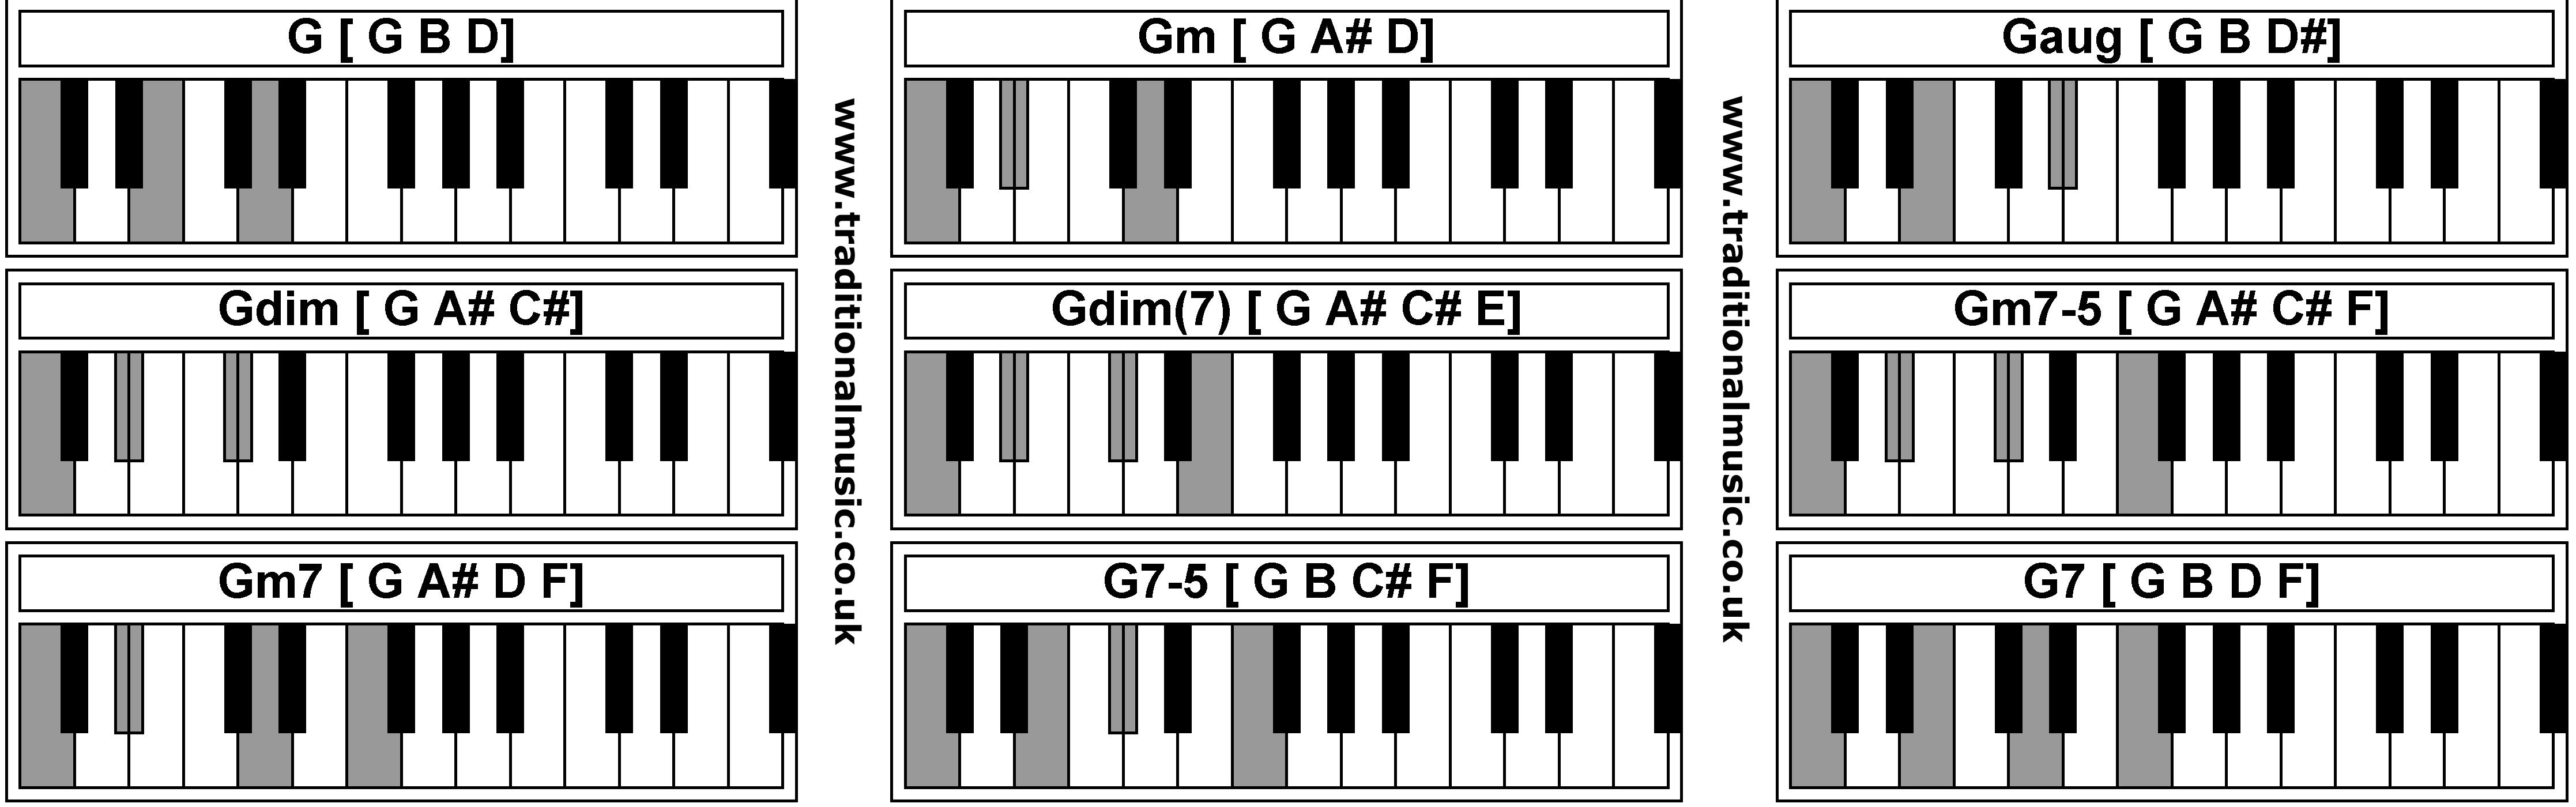 G Chord Piano Piano Chords G Gm Gaug Gdim Gdim Gm7 5 Gm7 G7 5 G7